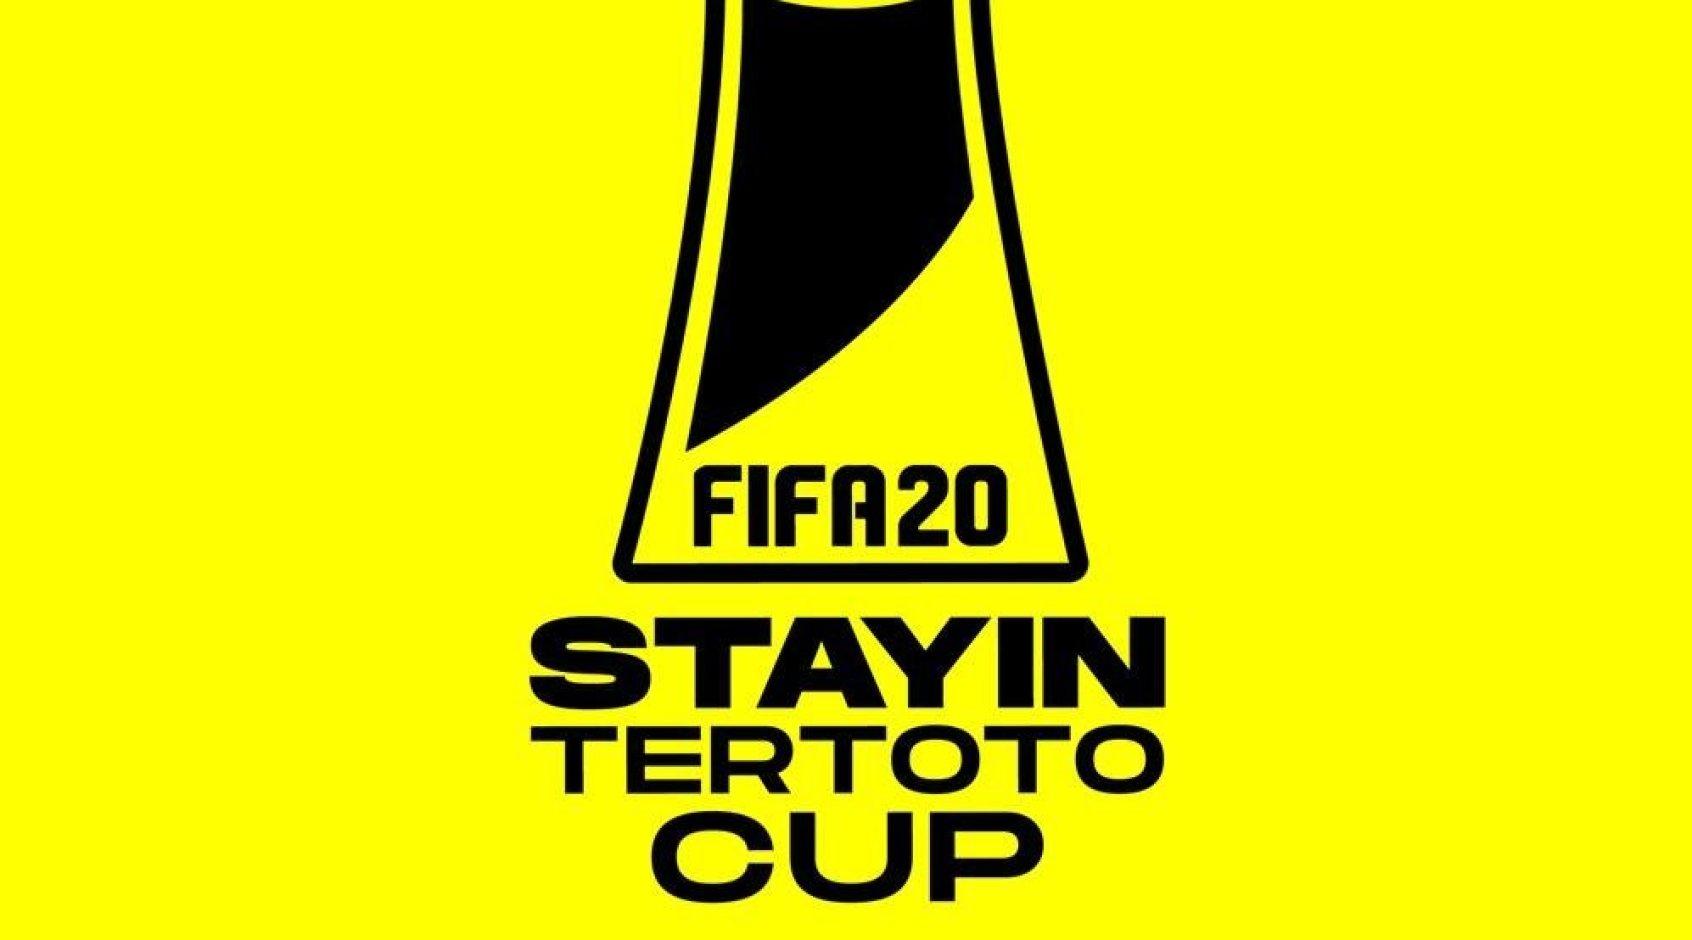 Киберфутбол. FIFA 20. #STAYINtertotoCup. Итоги 1/8 финала